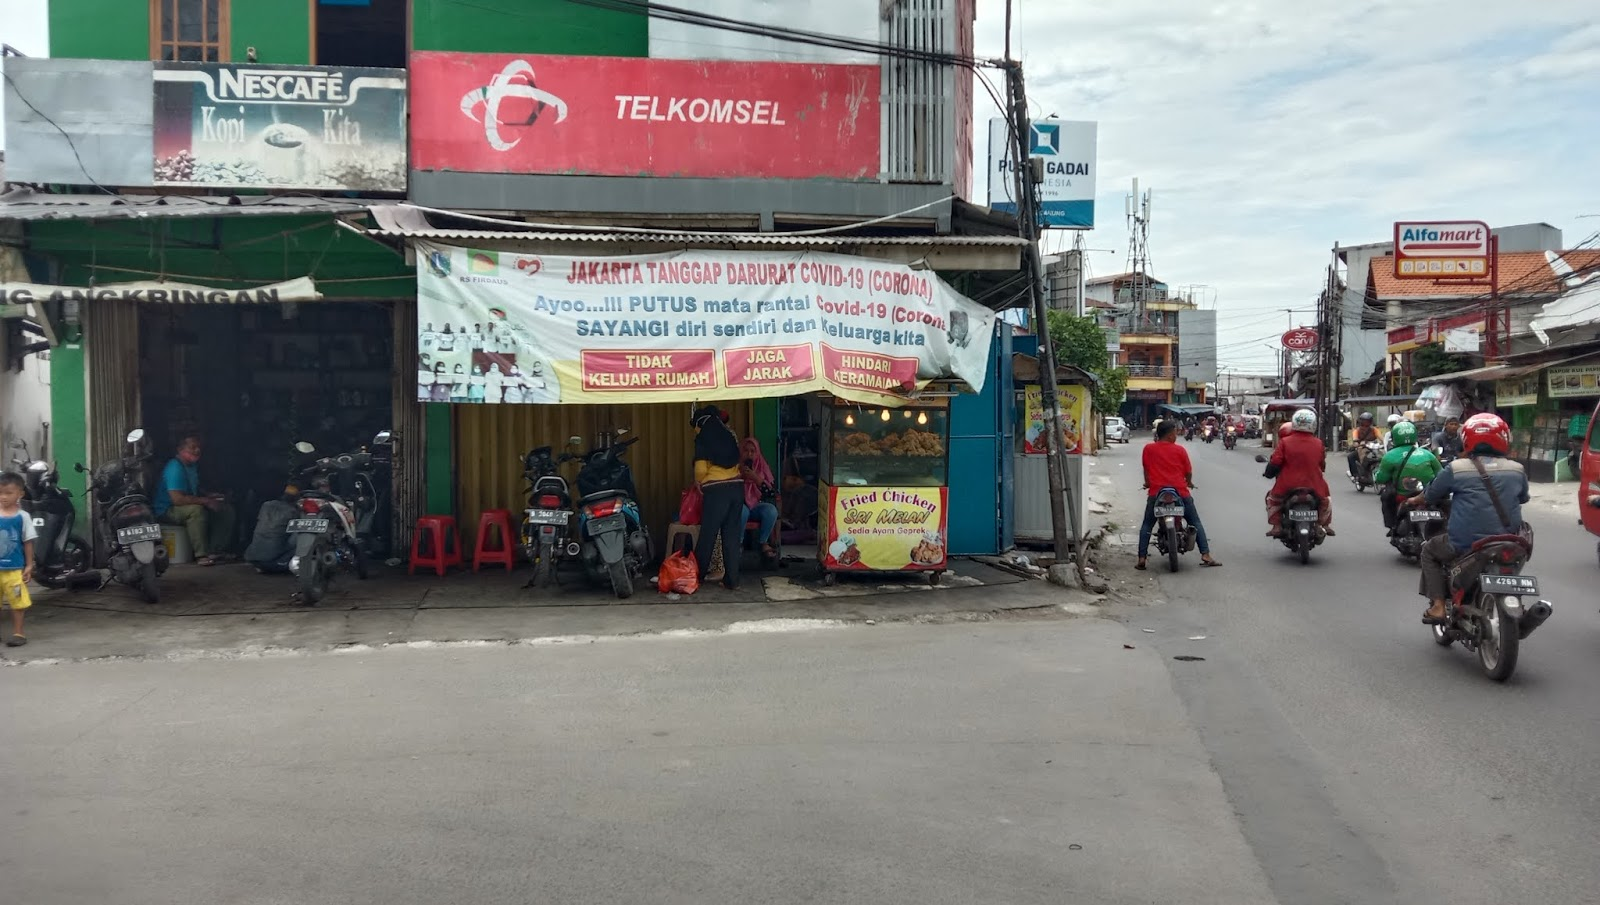 Fried Chicken Sri Melan Pasar Proyek Sukapura